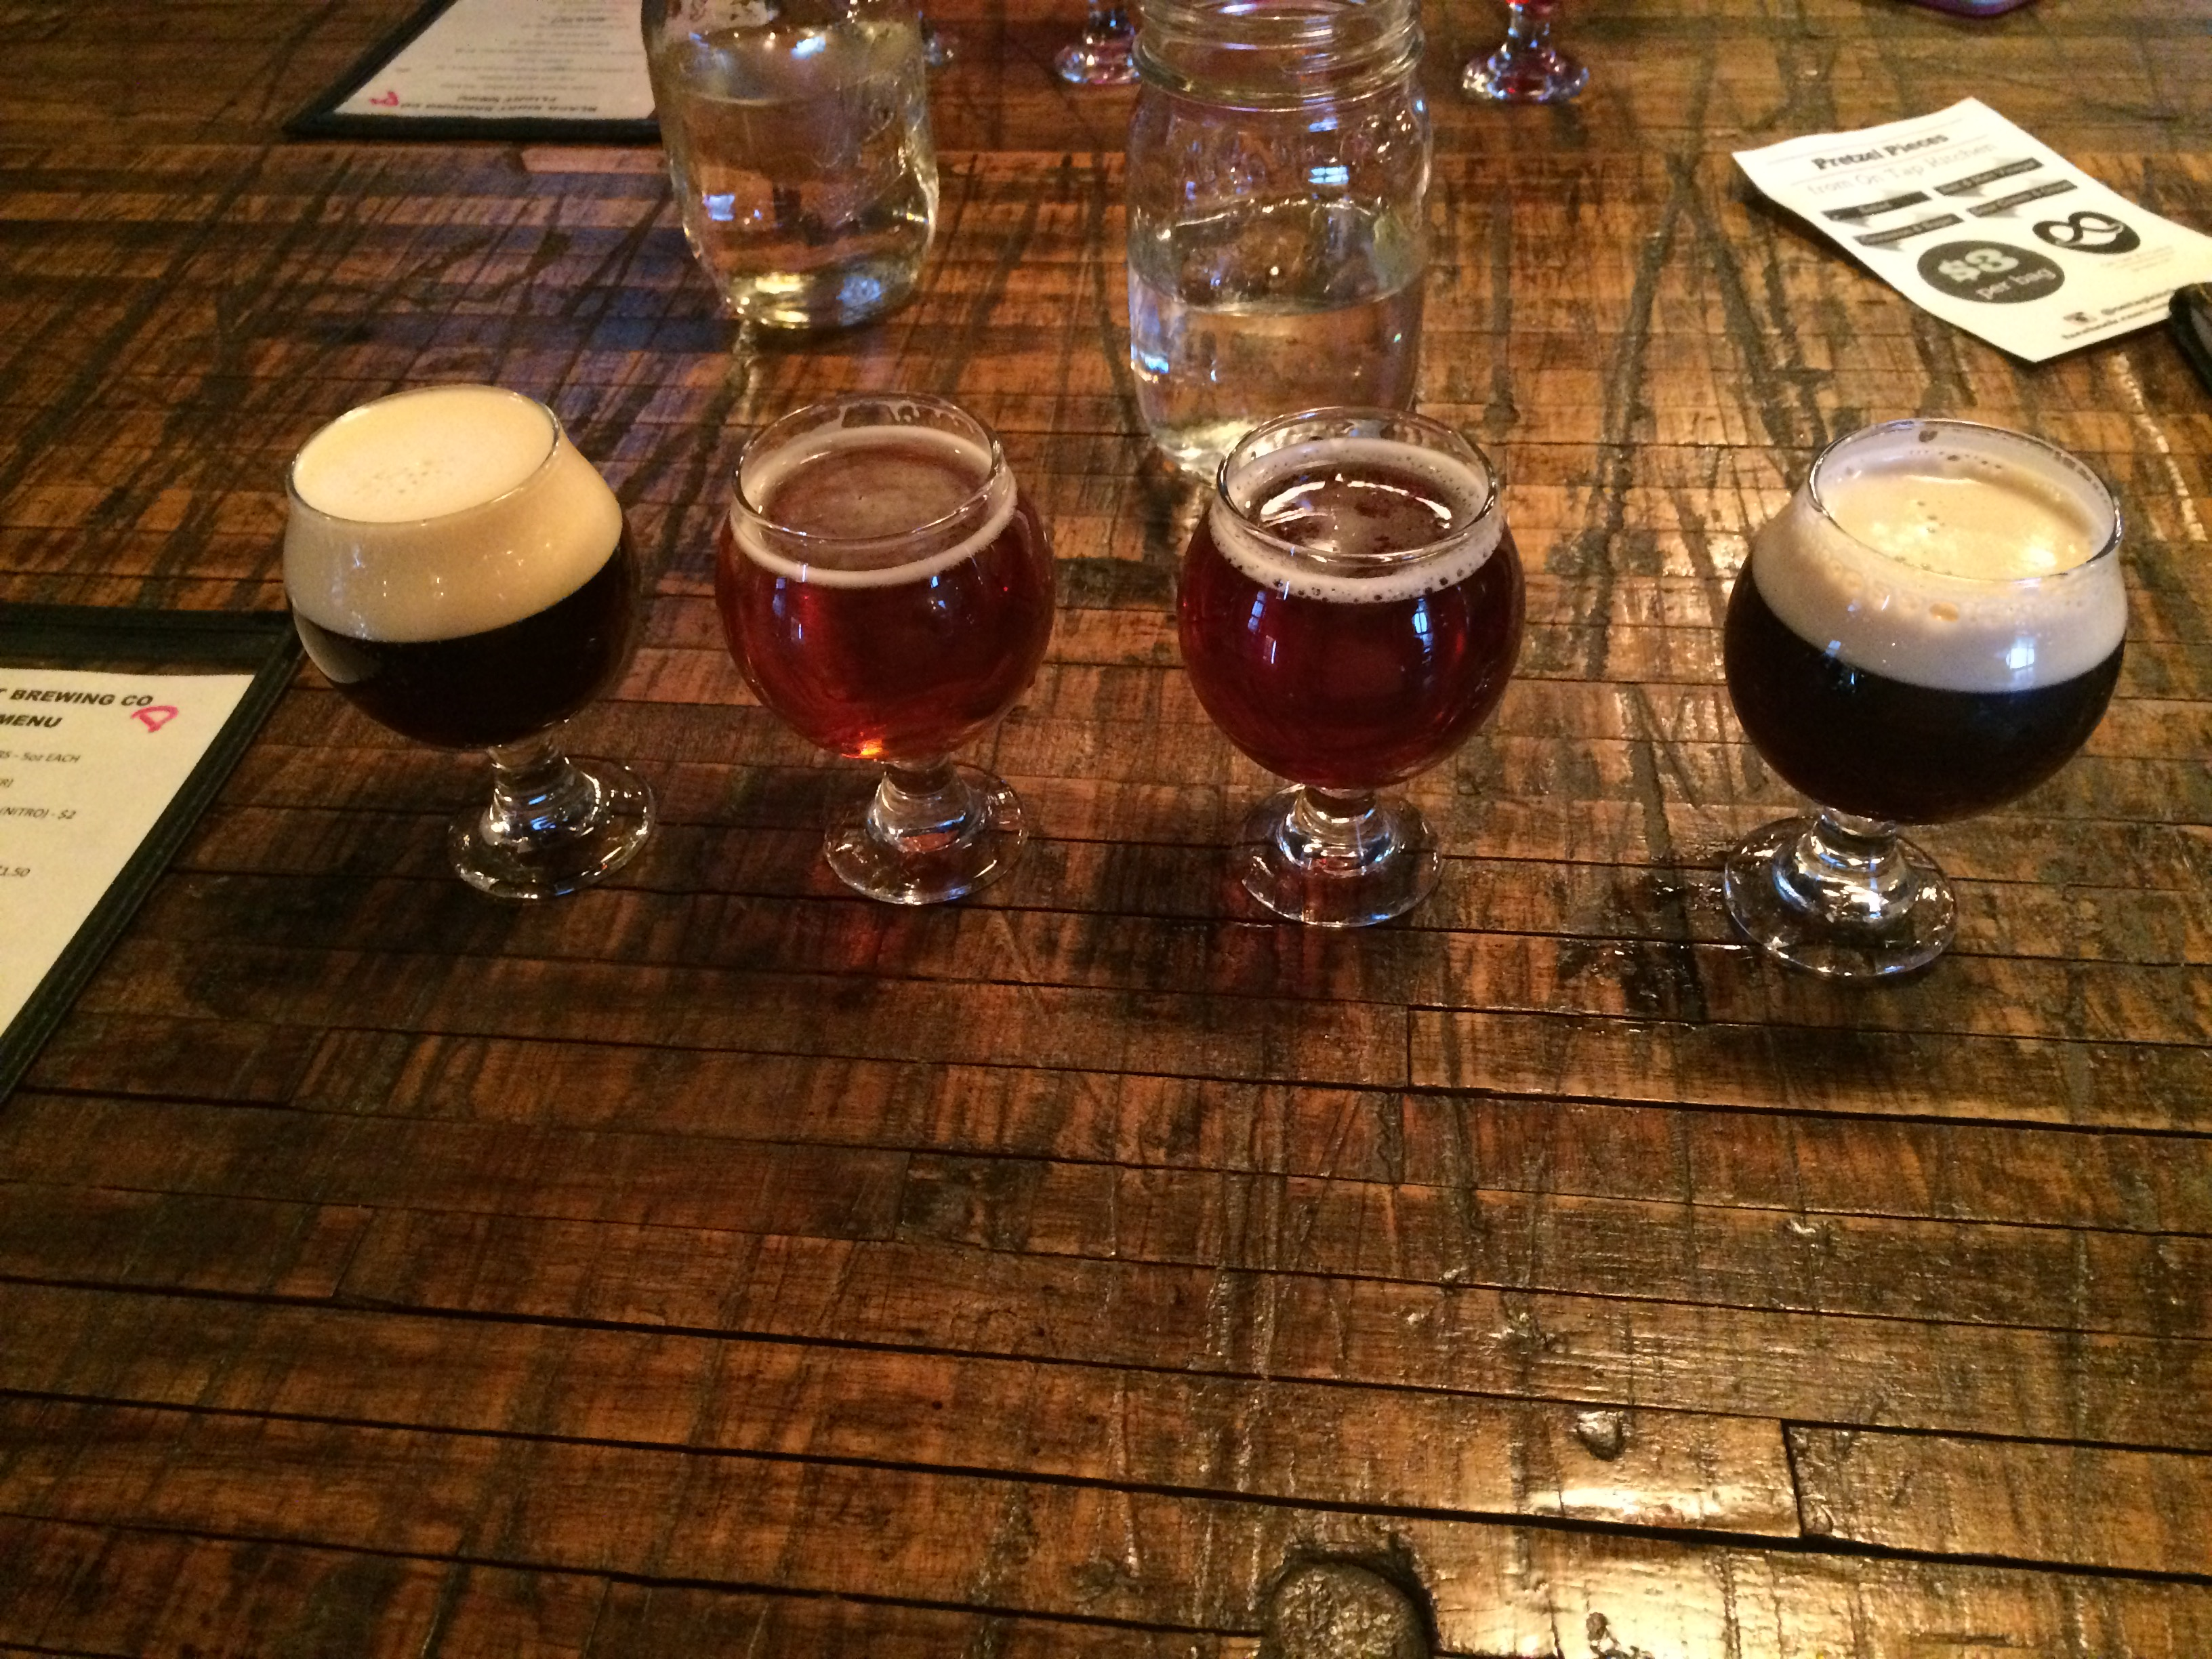 beer-black_shirt_brewery-denver_co-bar-microbrewery-tf_2016__13_